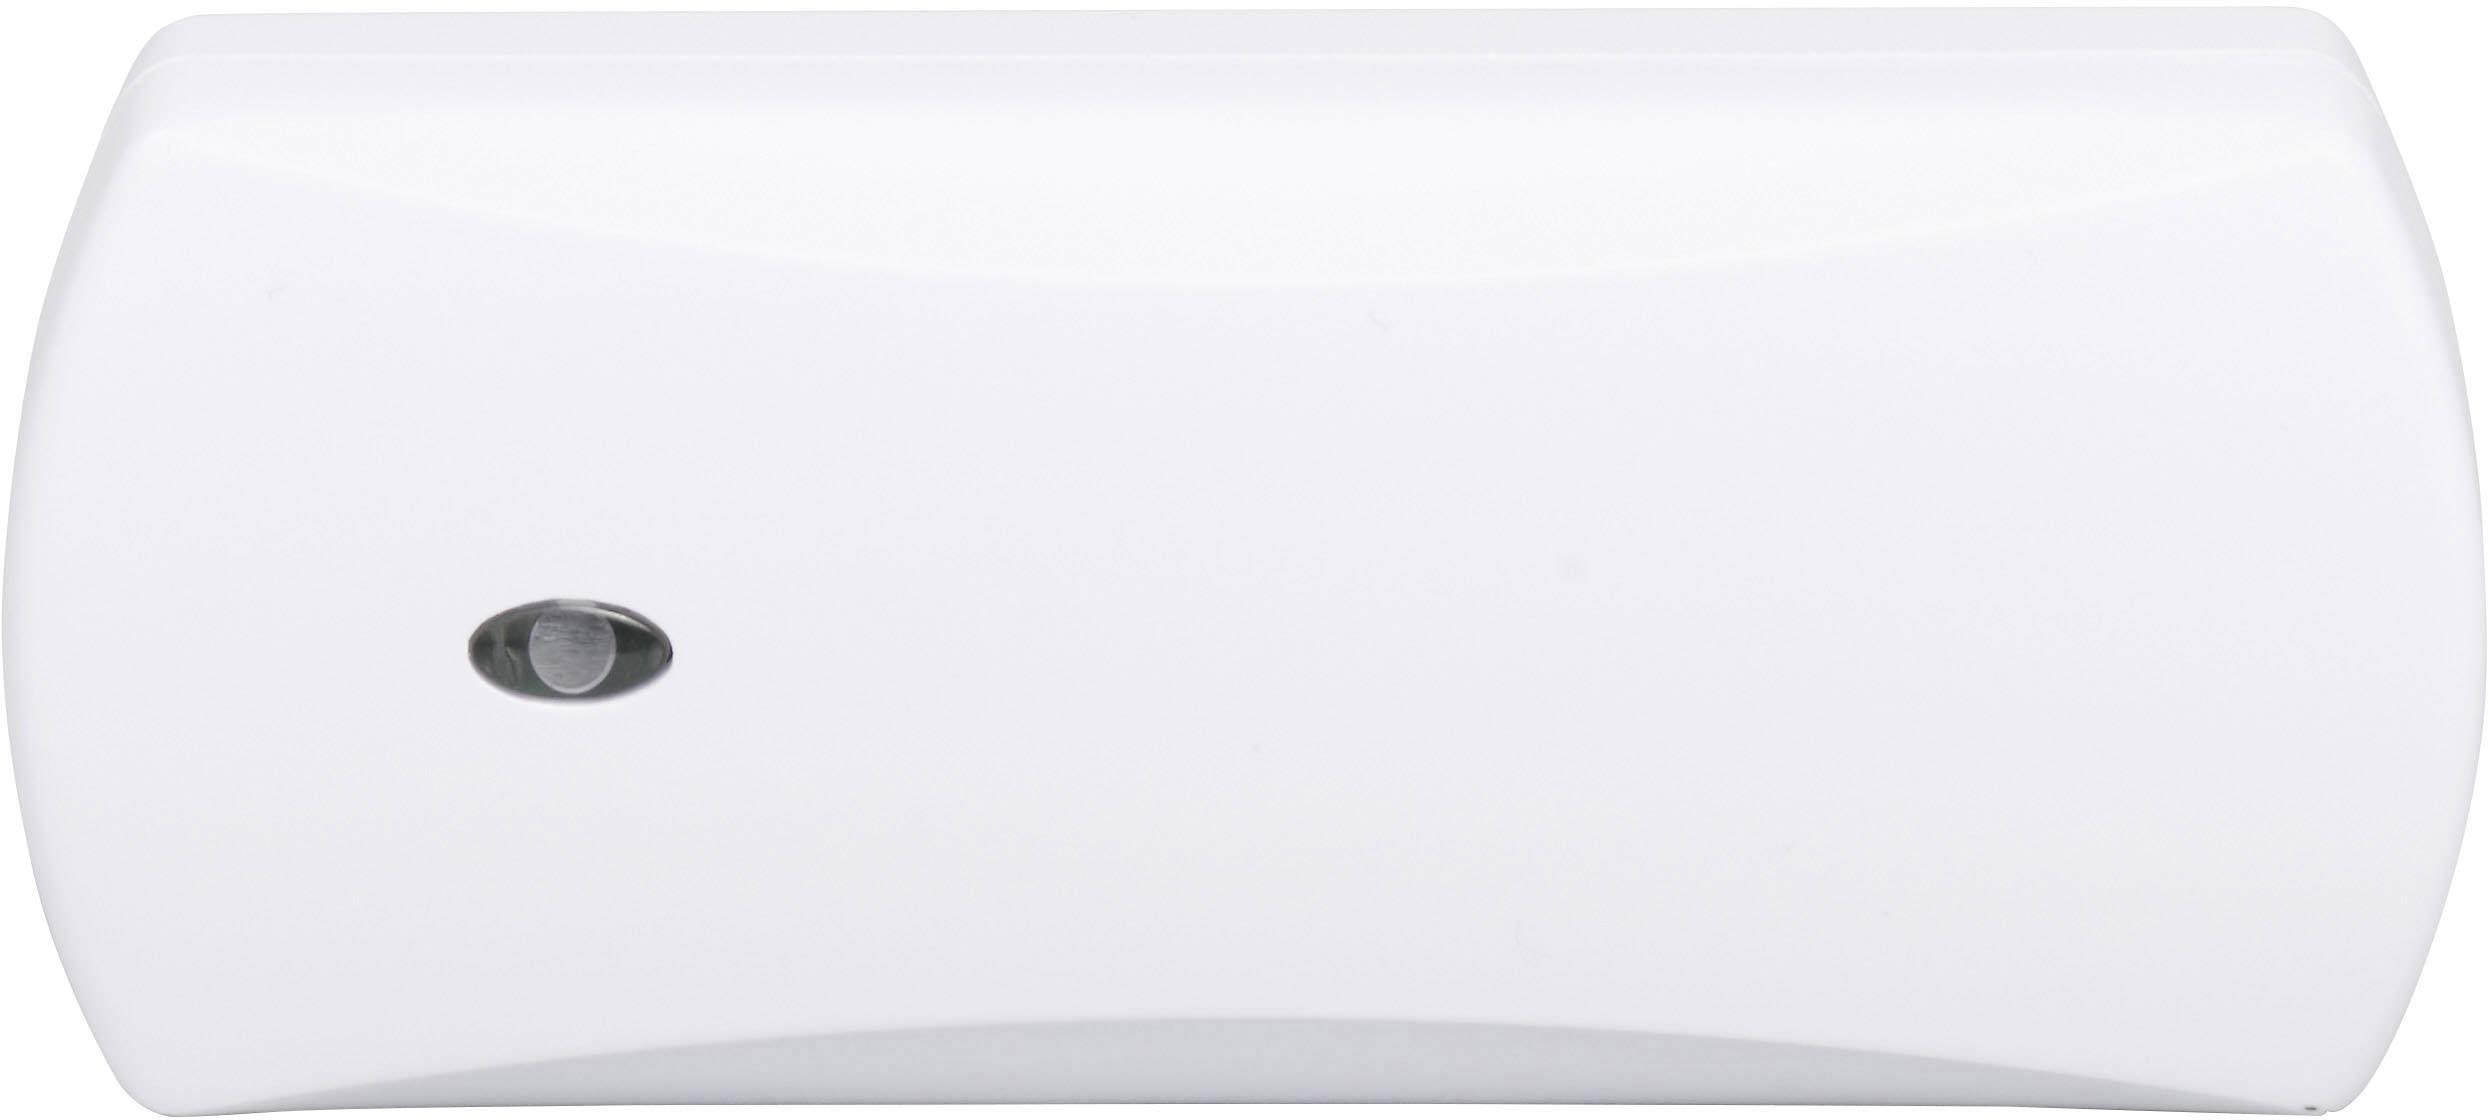 Bezdrôtový zvonček Heidemann Funk-Konverter HX 70399, max. dosah 100 m, biela